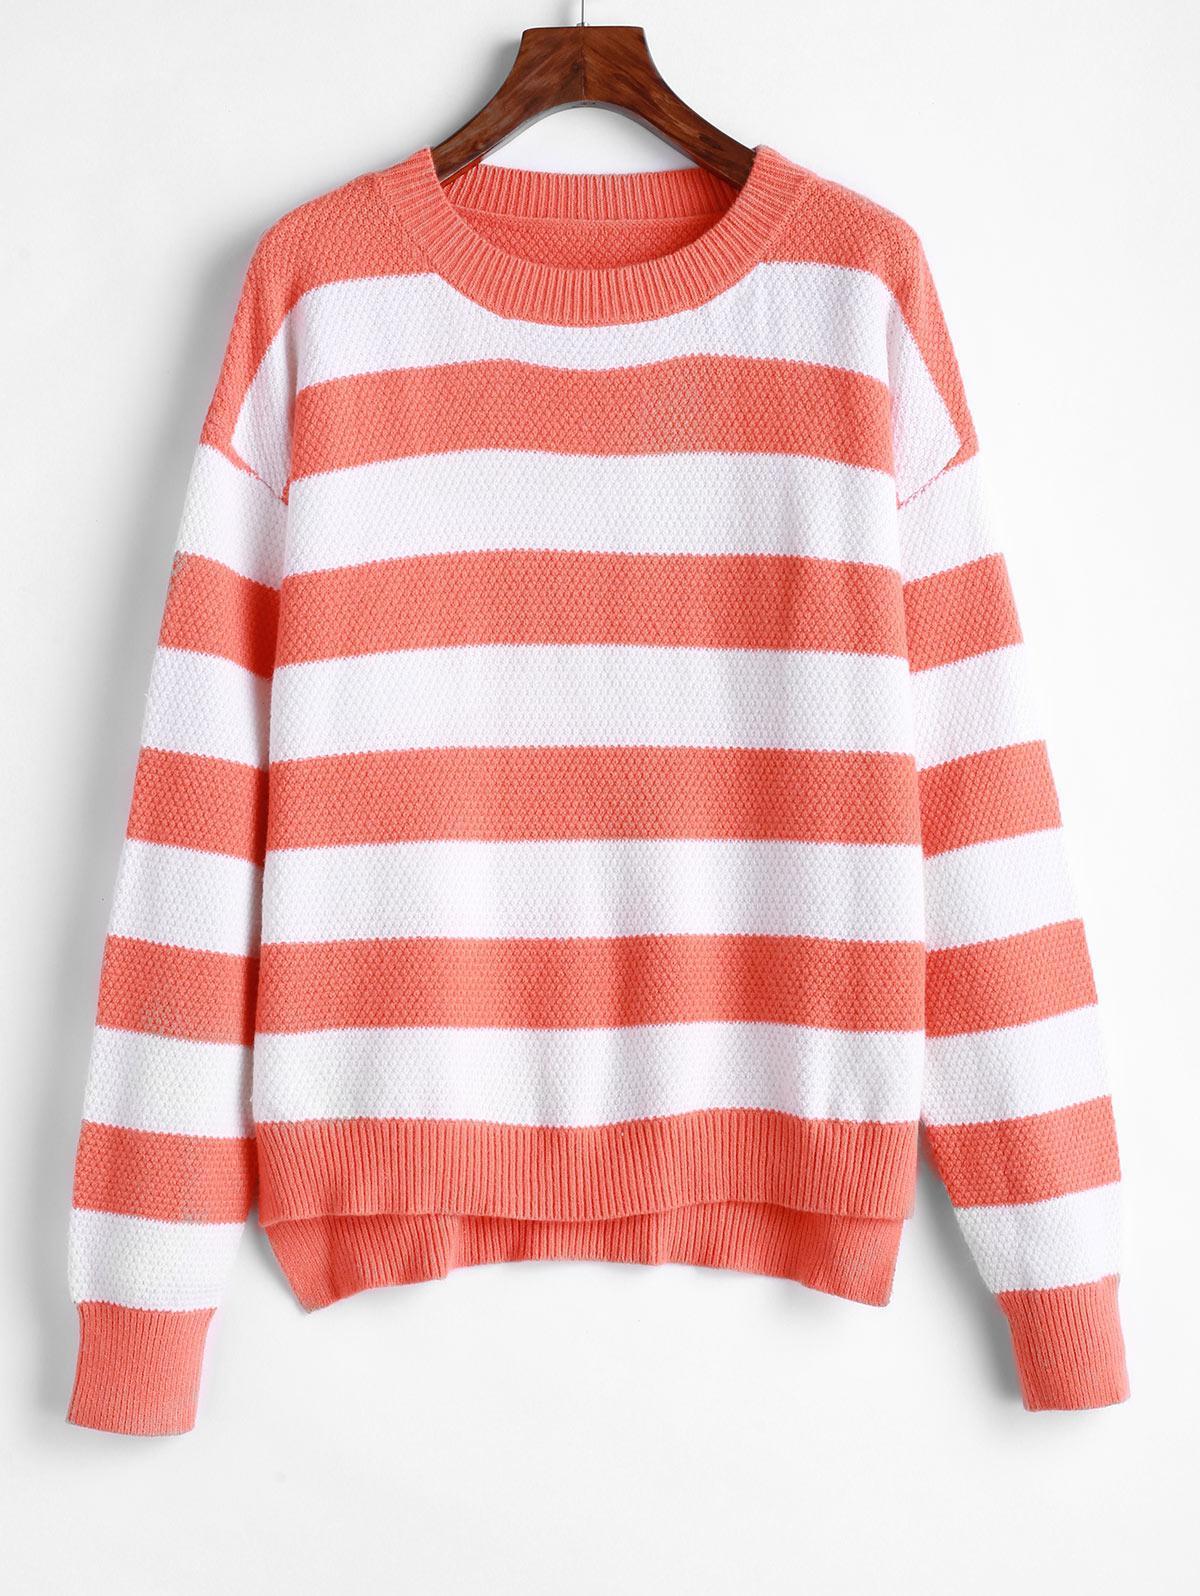 ZAFUL Striped High Low Drop Shoulder Jumper Sweater